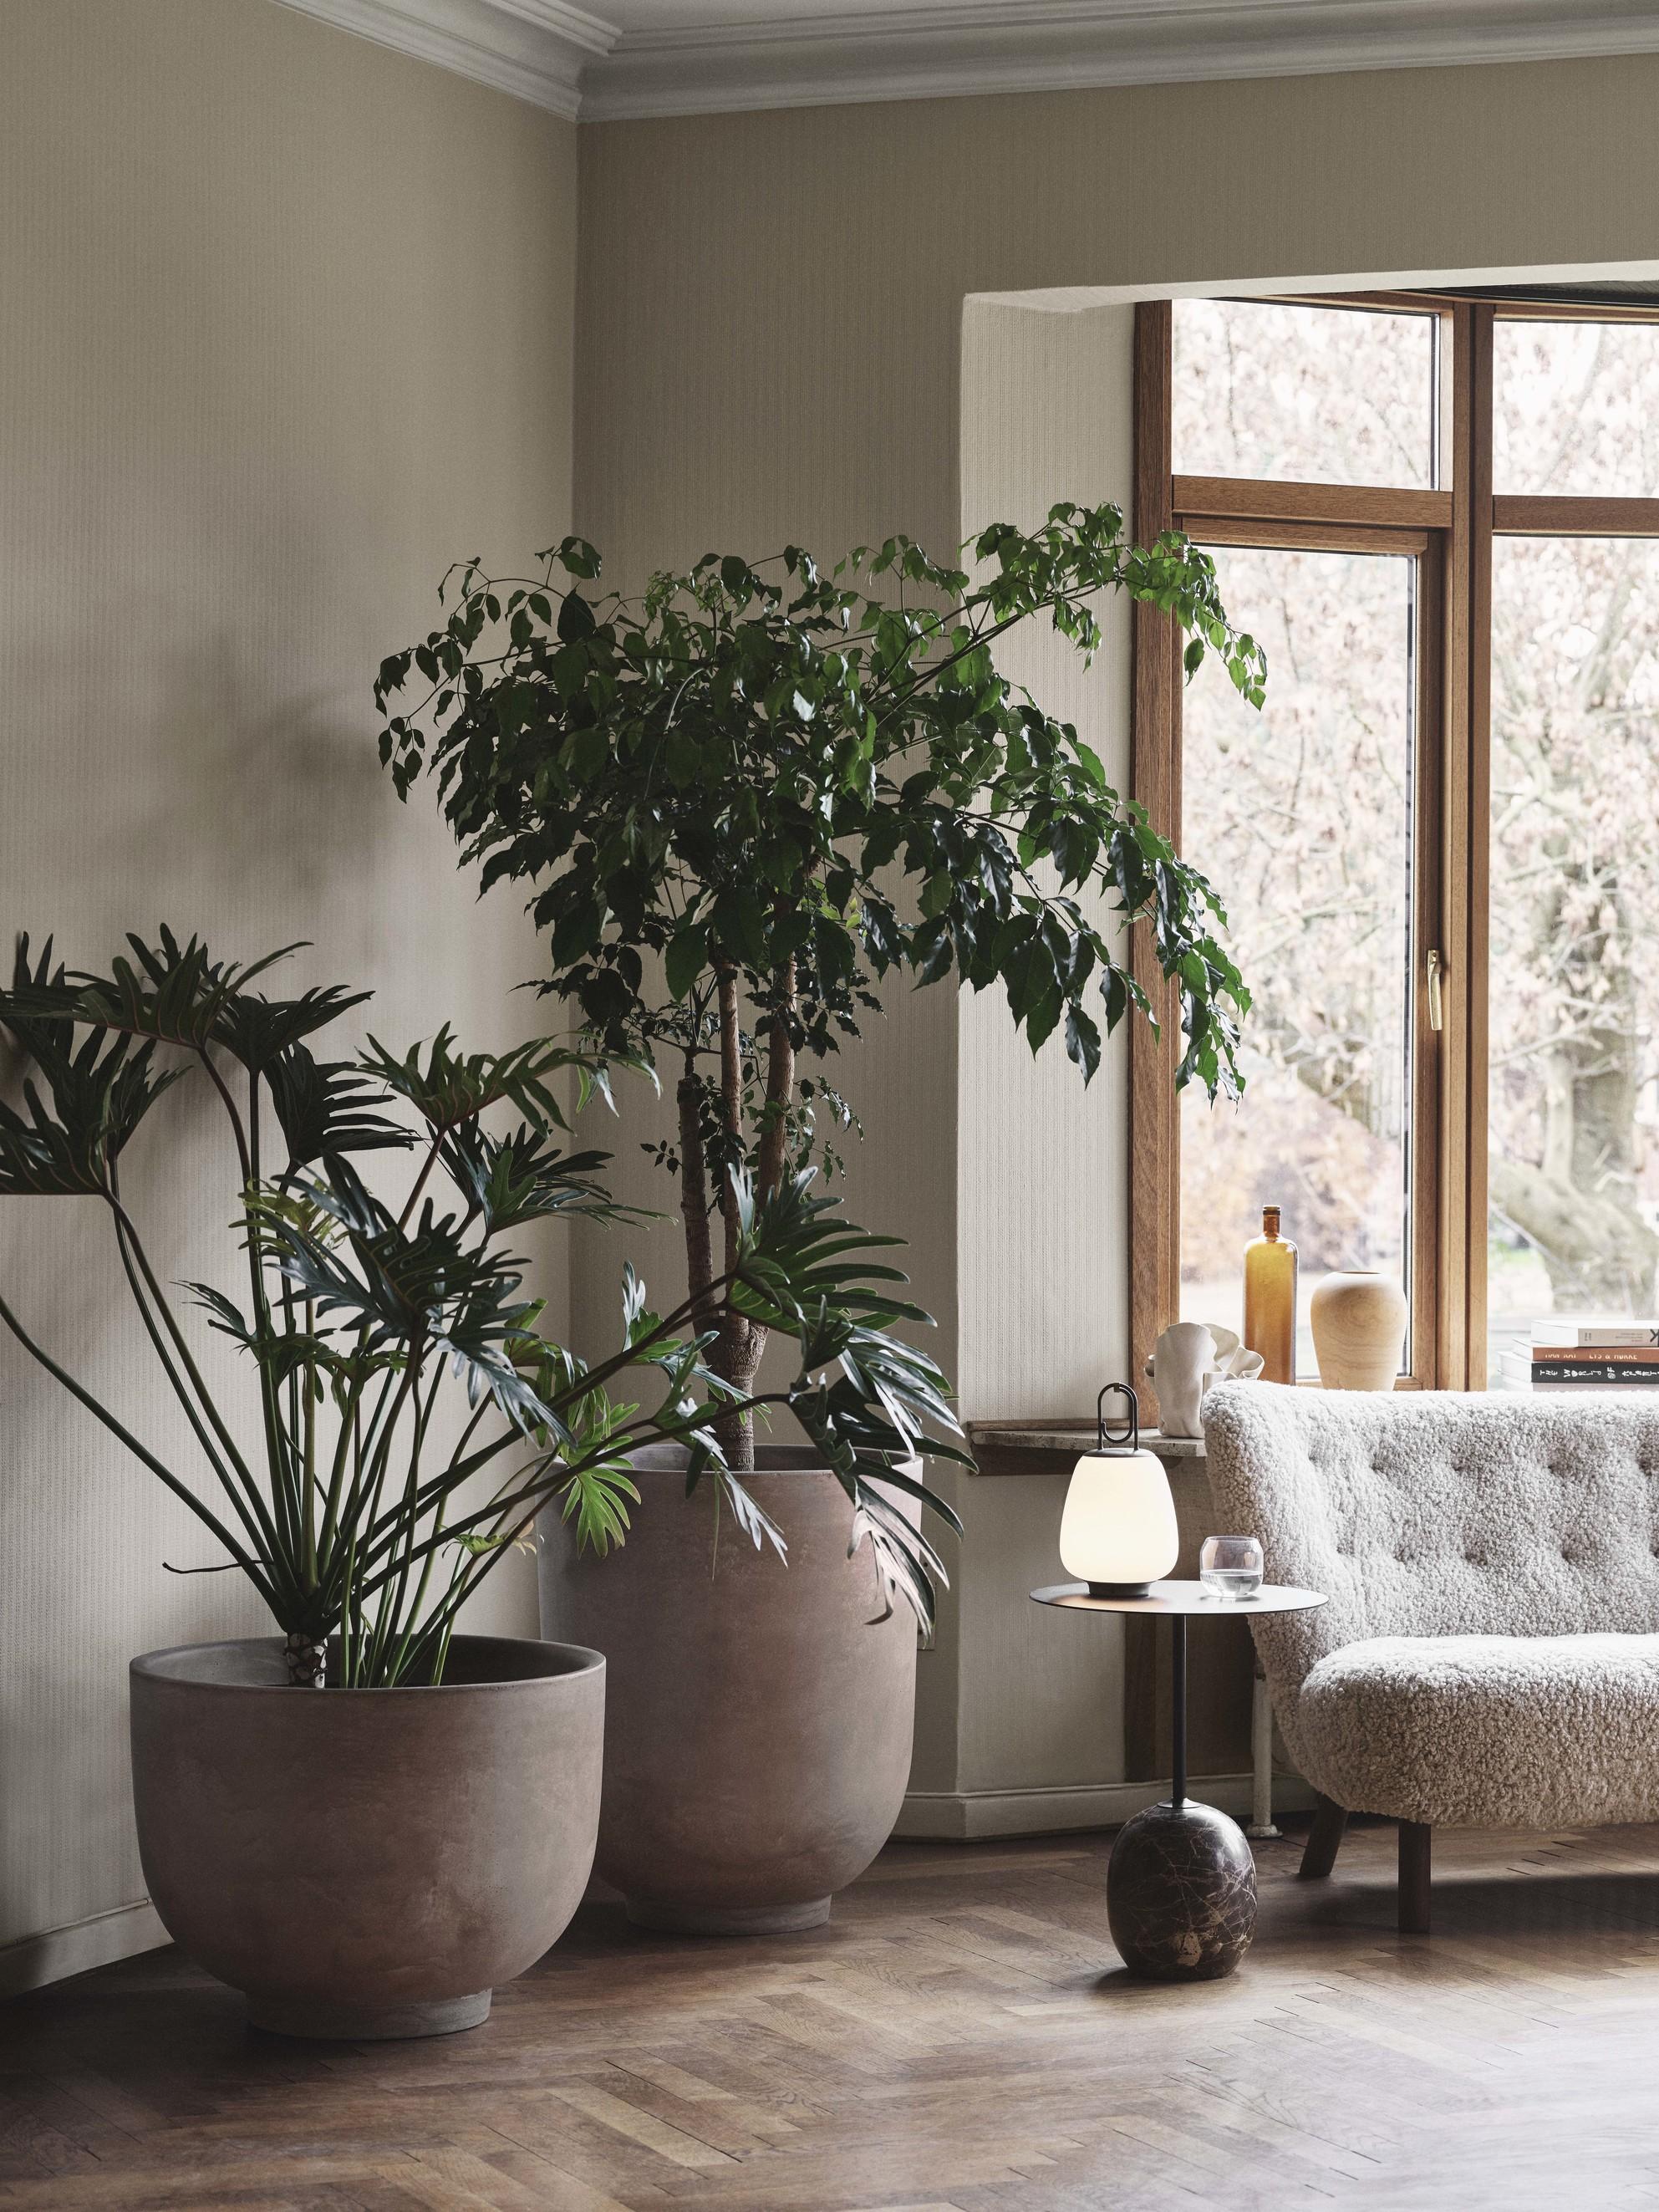 &Tradition Collect Planter SC43 Silver Grey H: 45 cm